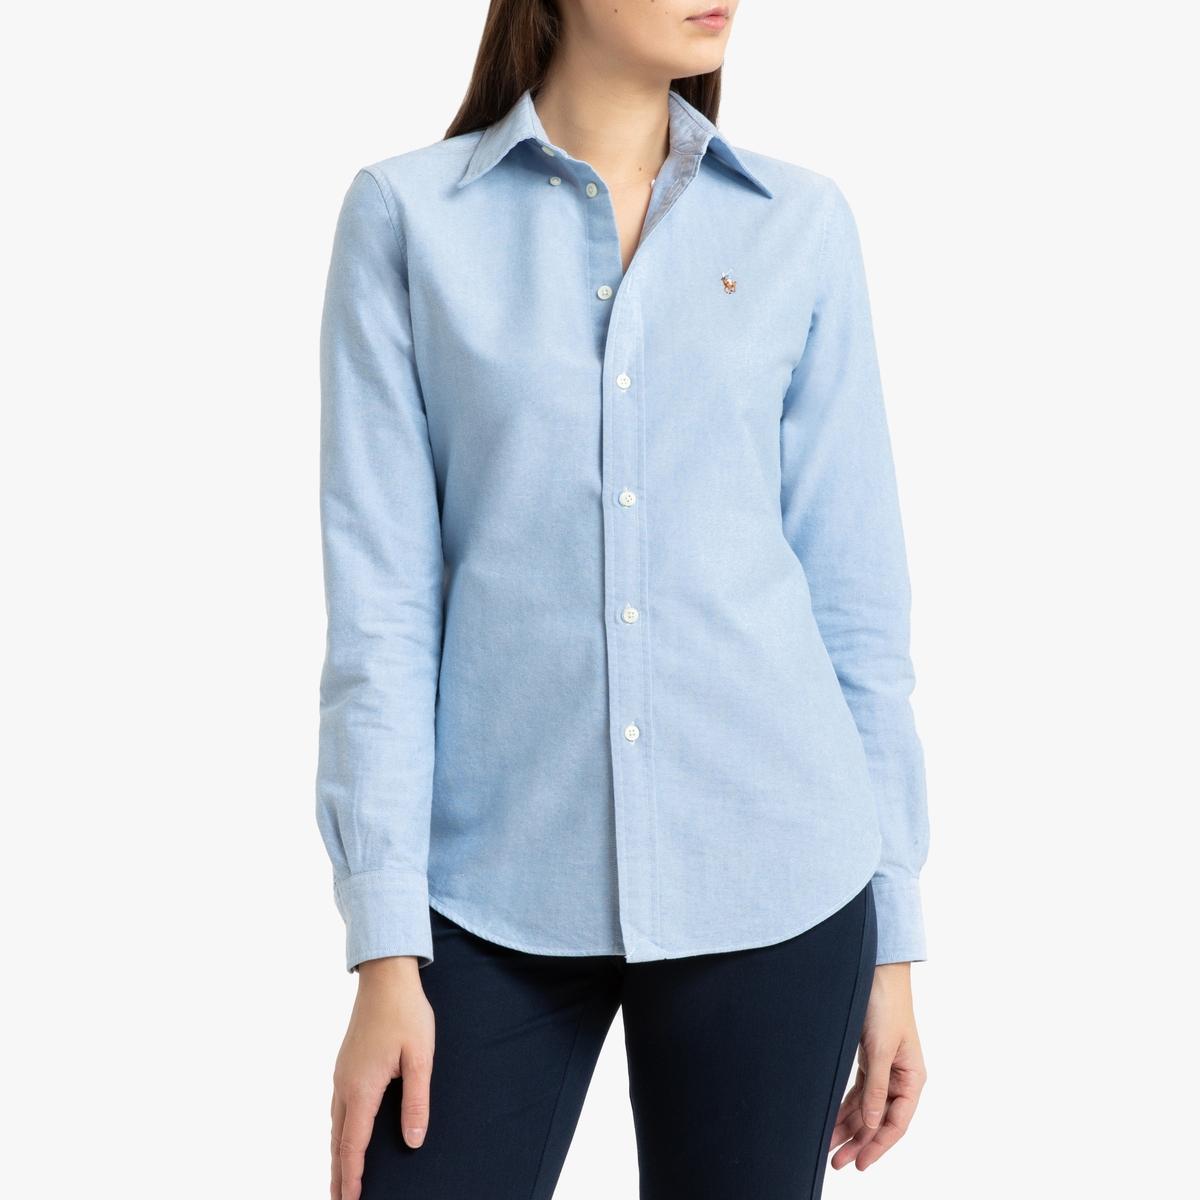 Рубашка La Redoute Из ткани Oxford с длинными рукавами S синий